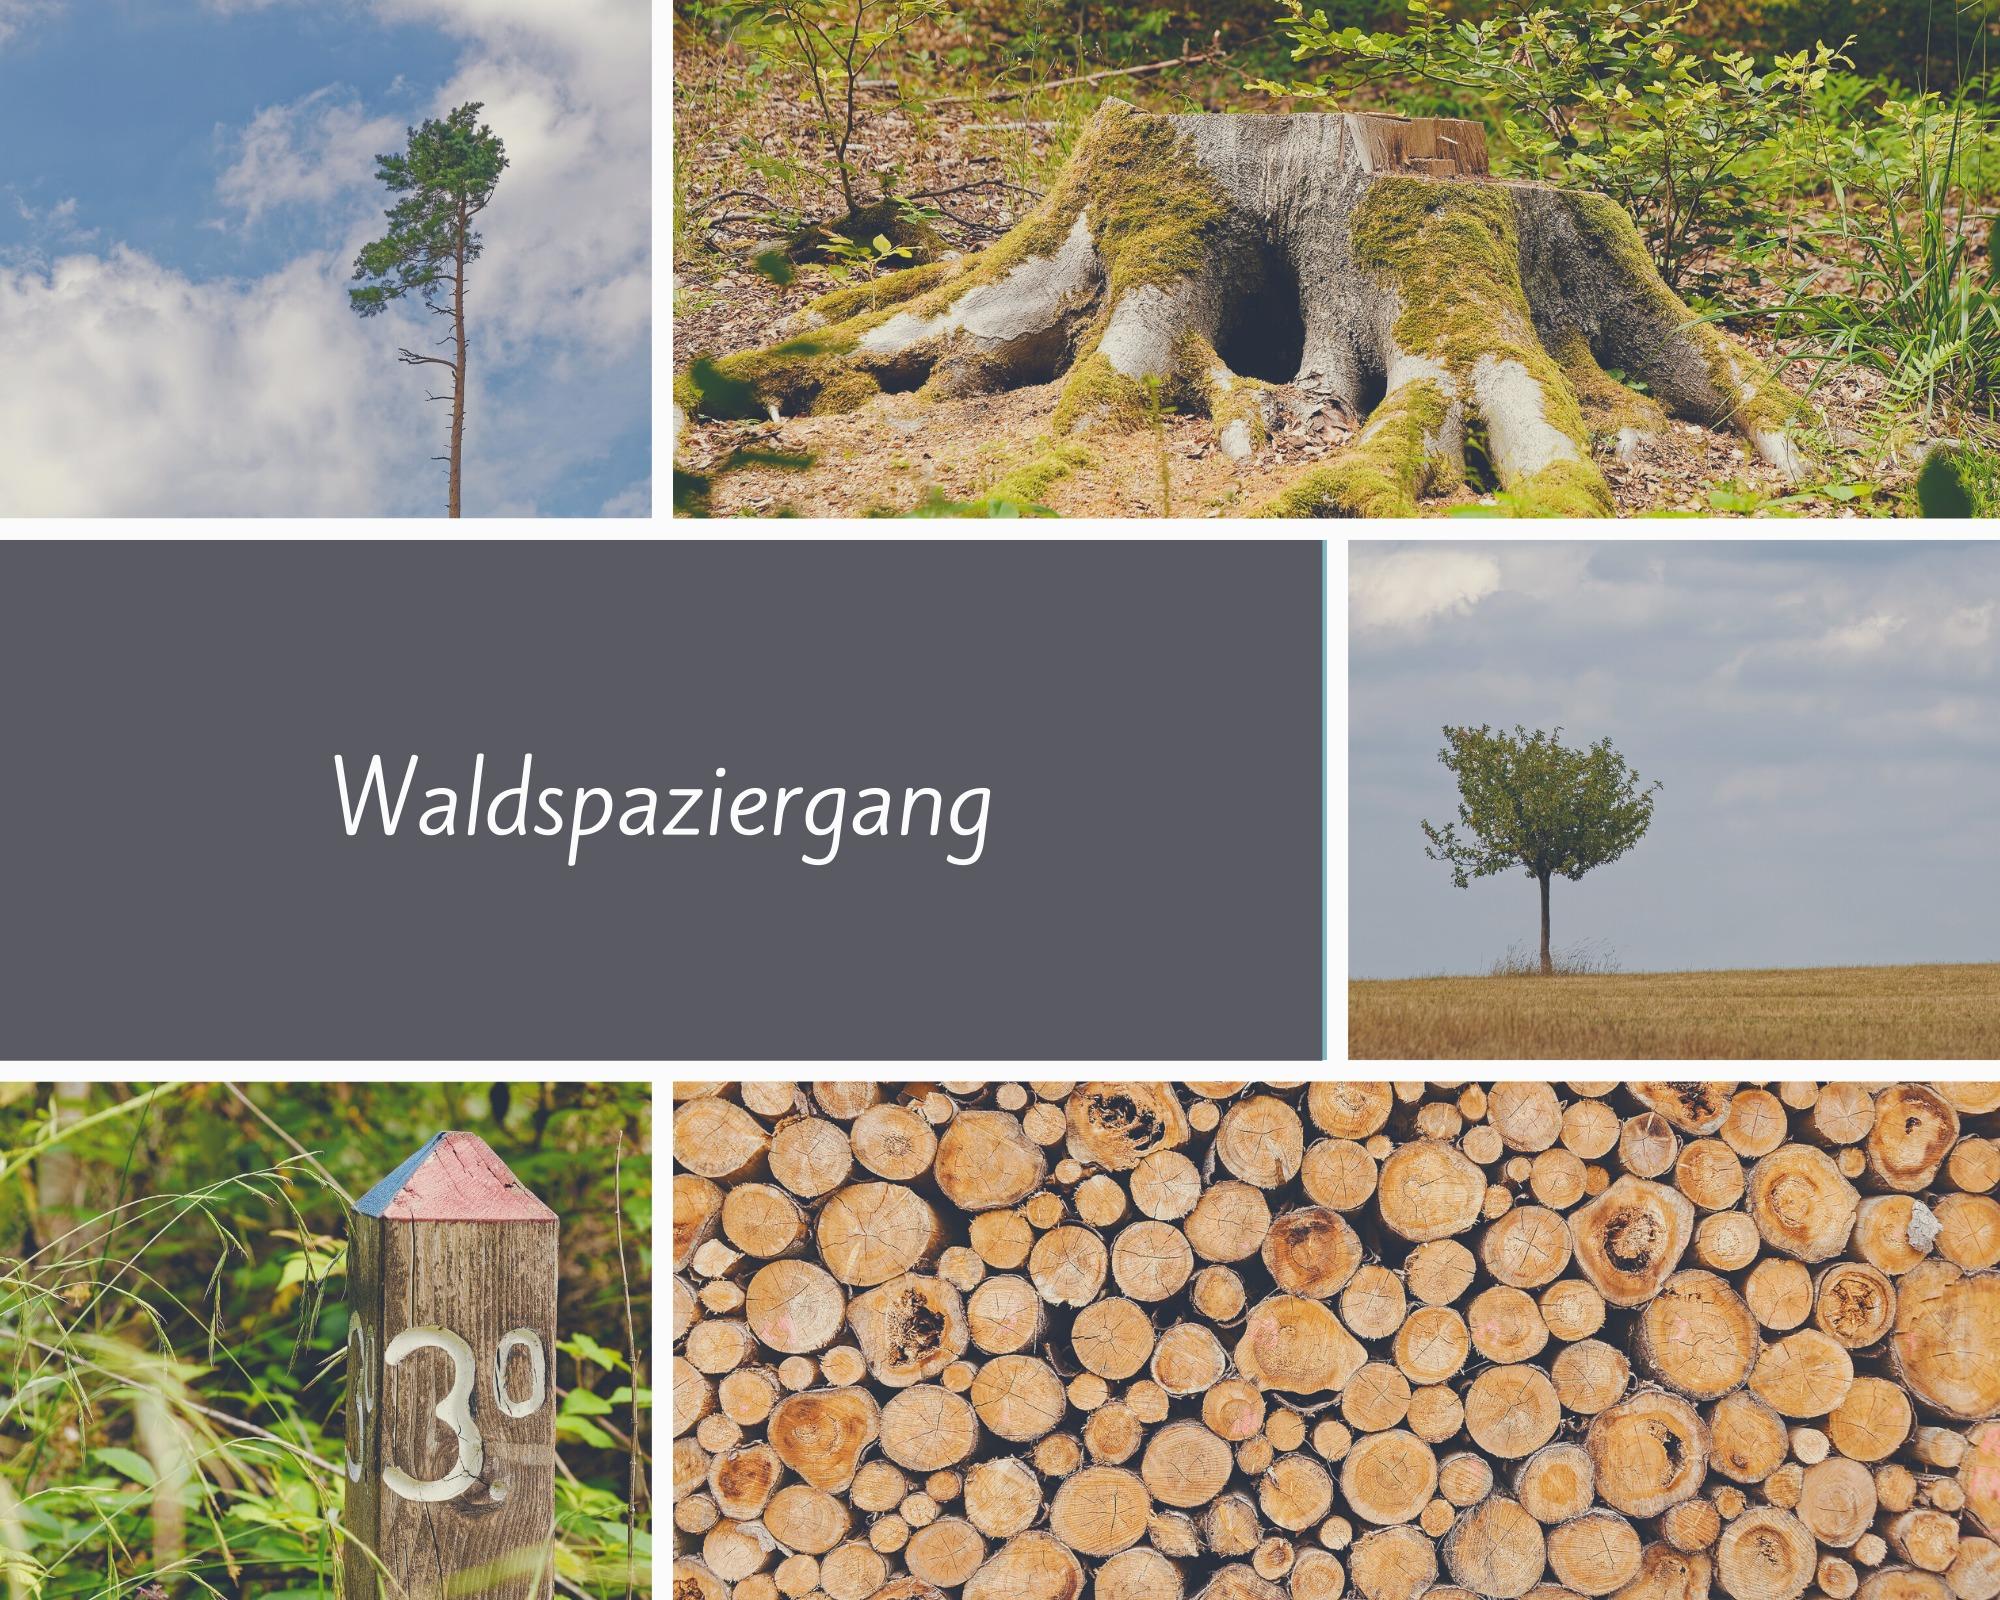 Titelbild: Waldspaziergang Juli 2020